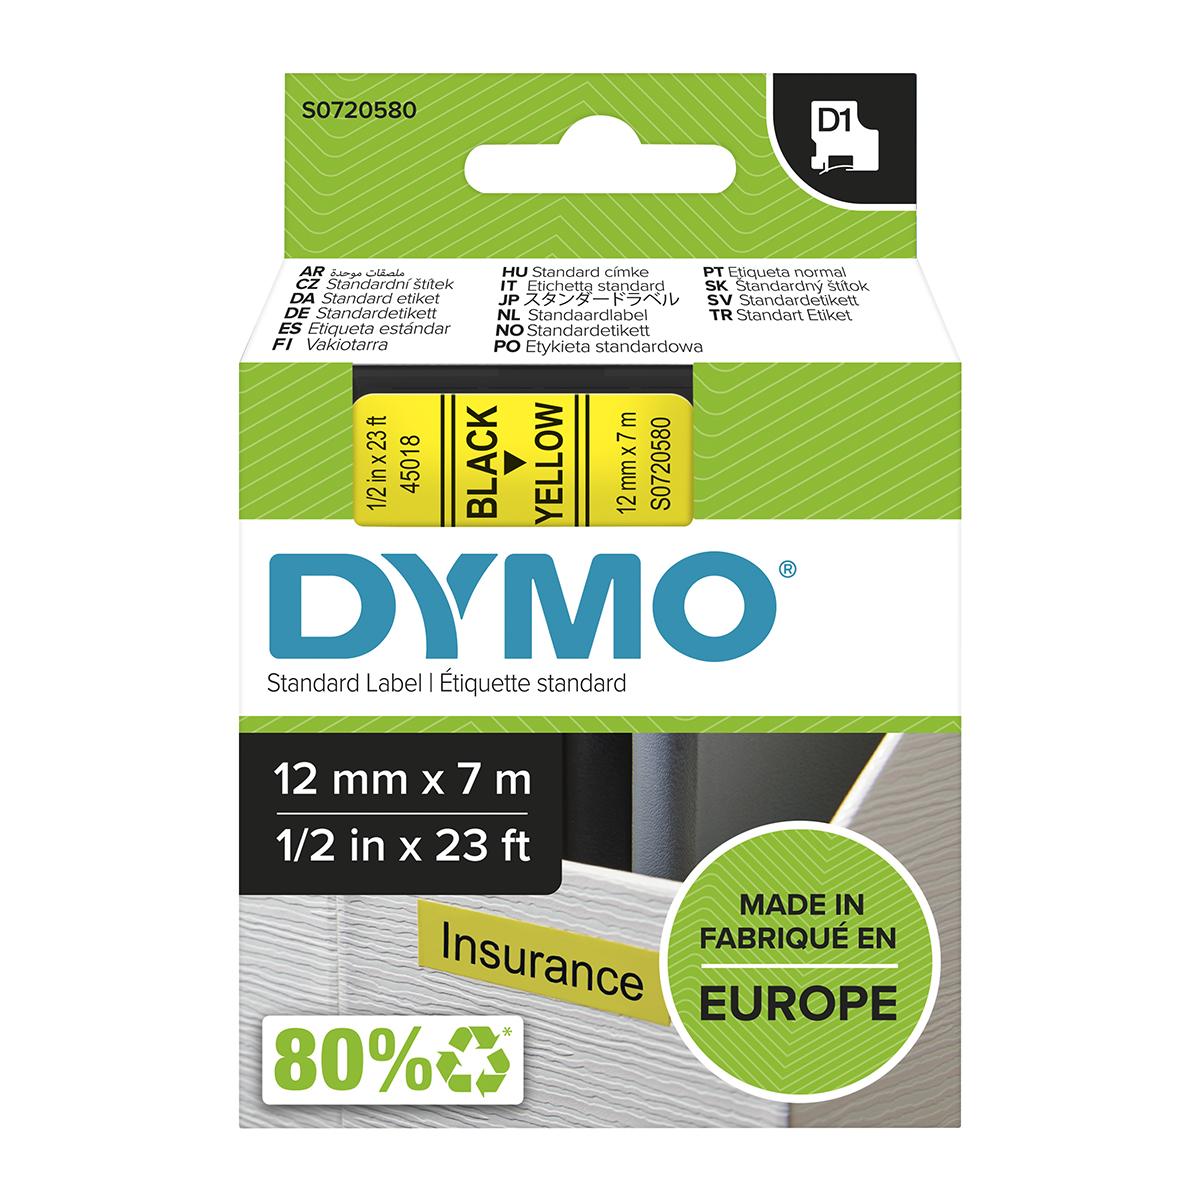 Dymo 45018 D1 12mm x 7m Black on Yellow Tape